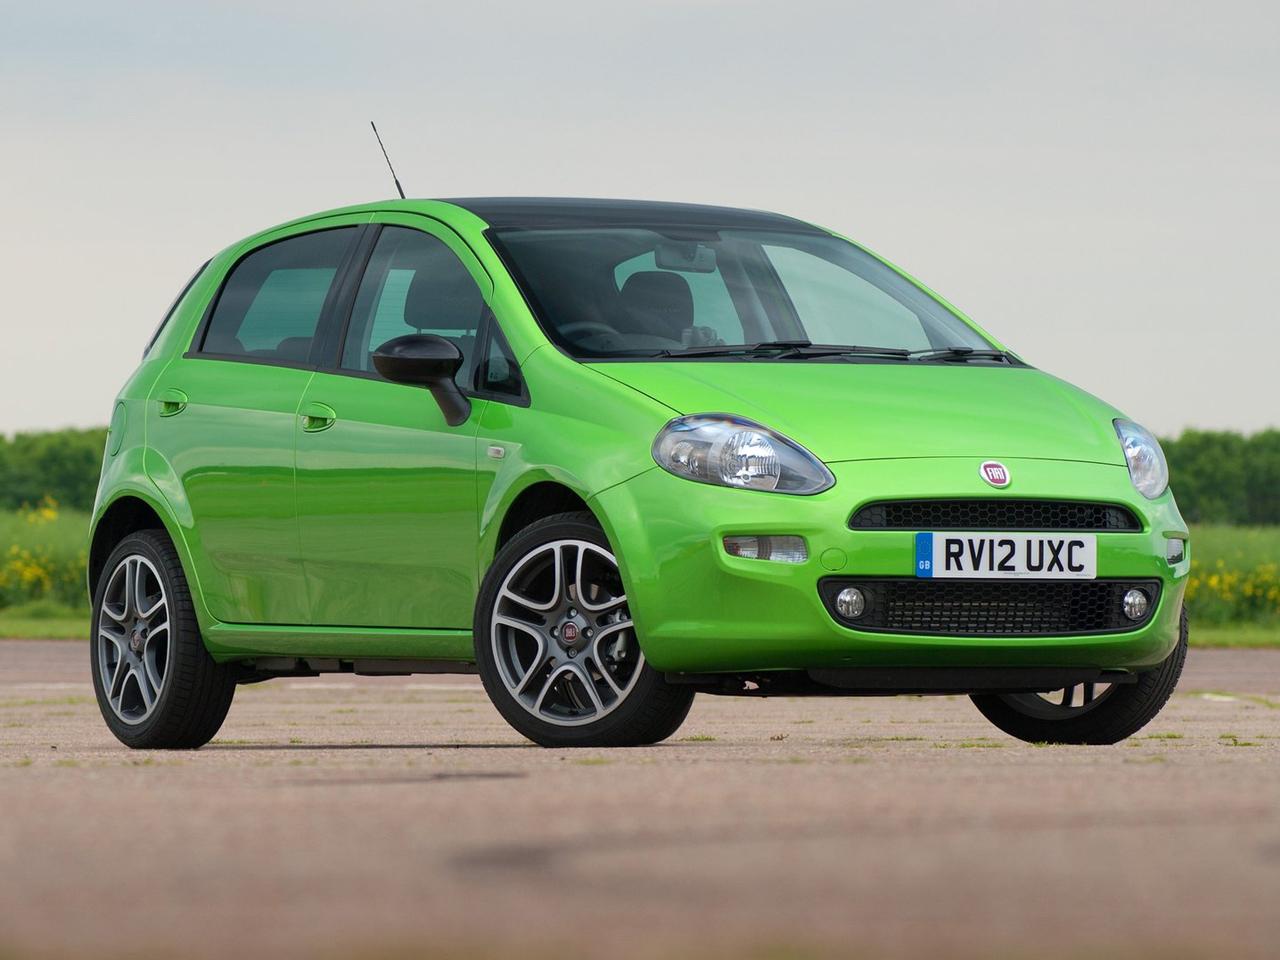 2020 Fiat Punto Picture